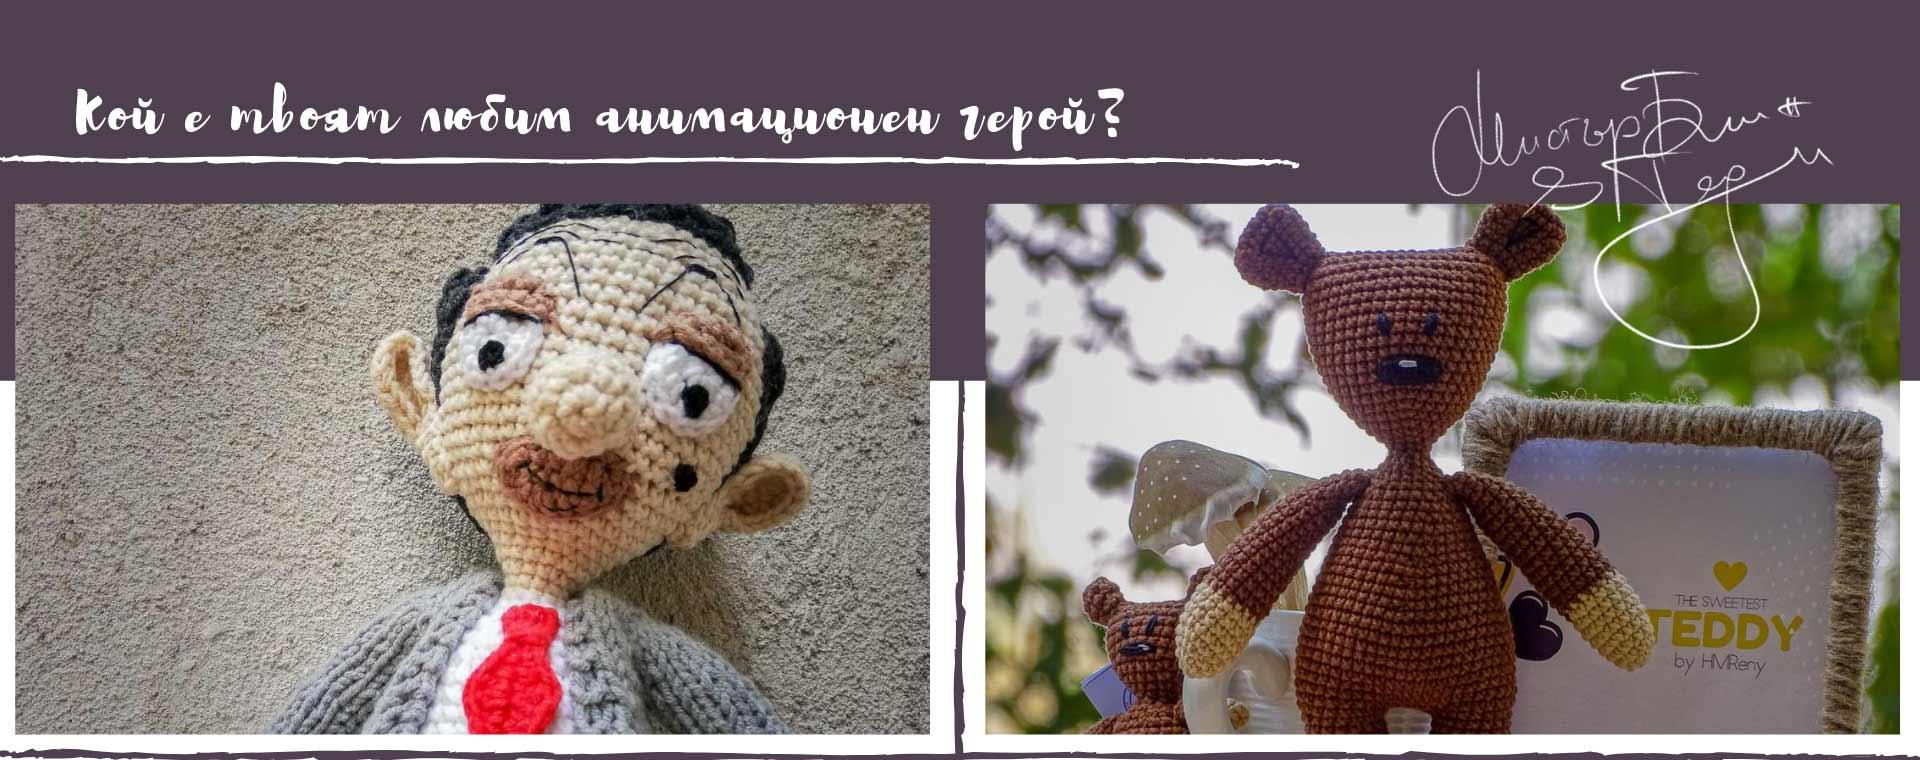 mr-bean-and-teddy-1920_760